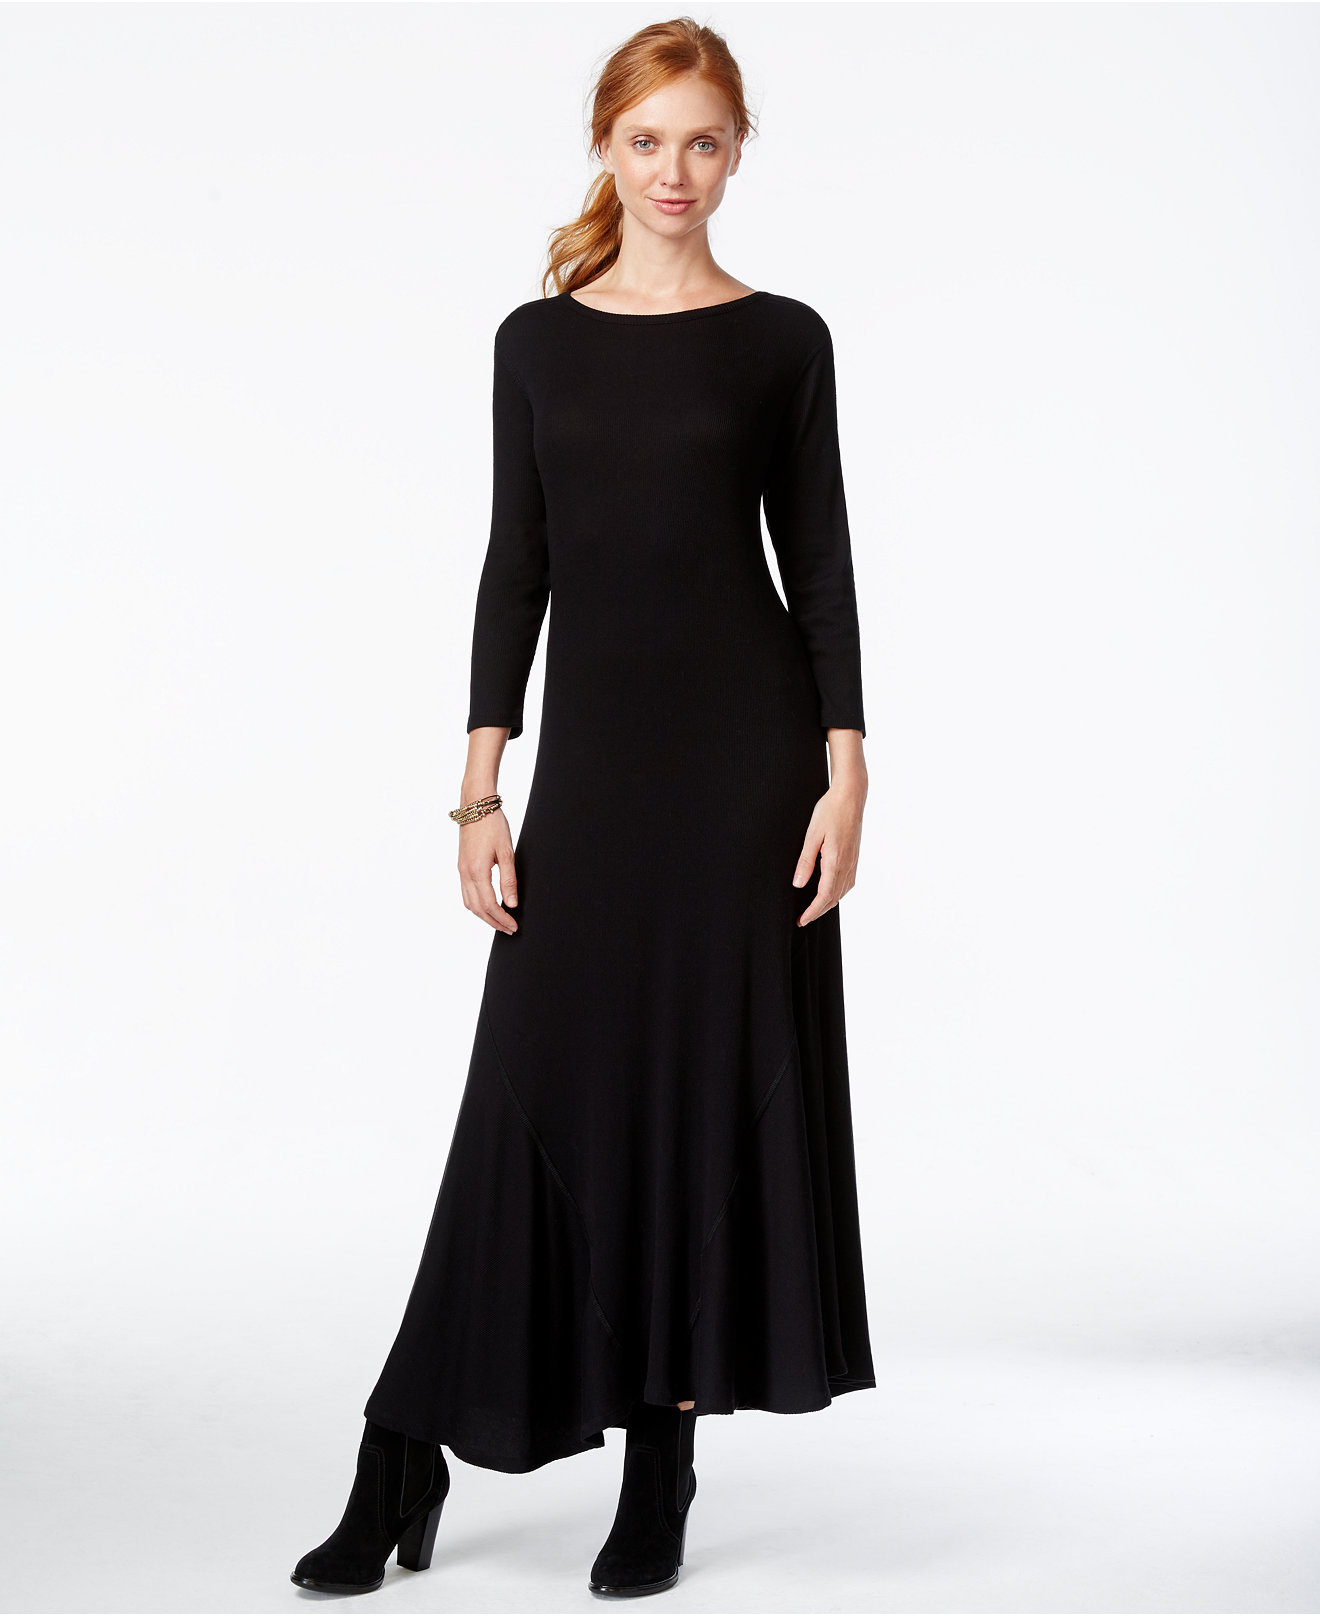 Sleeved Maxi Dresses